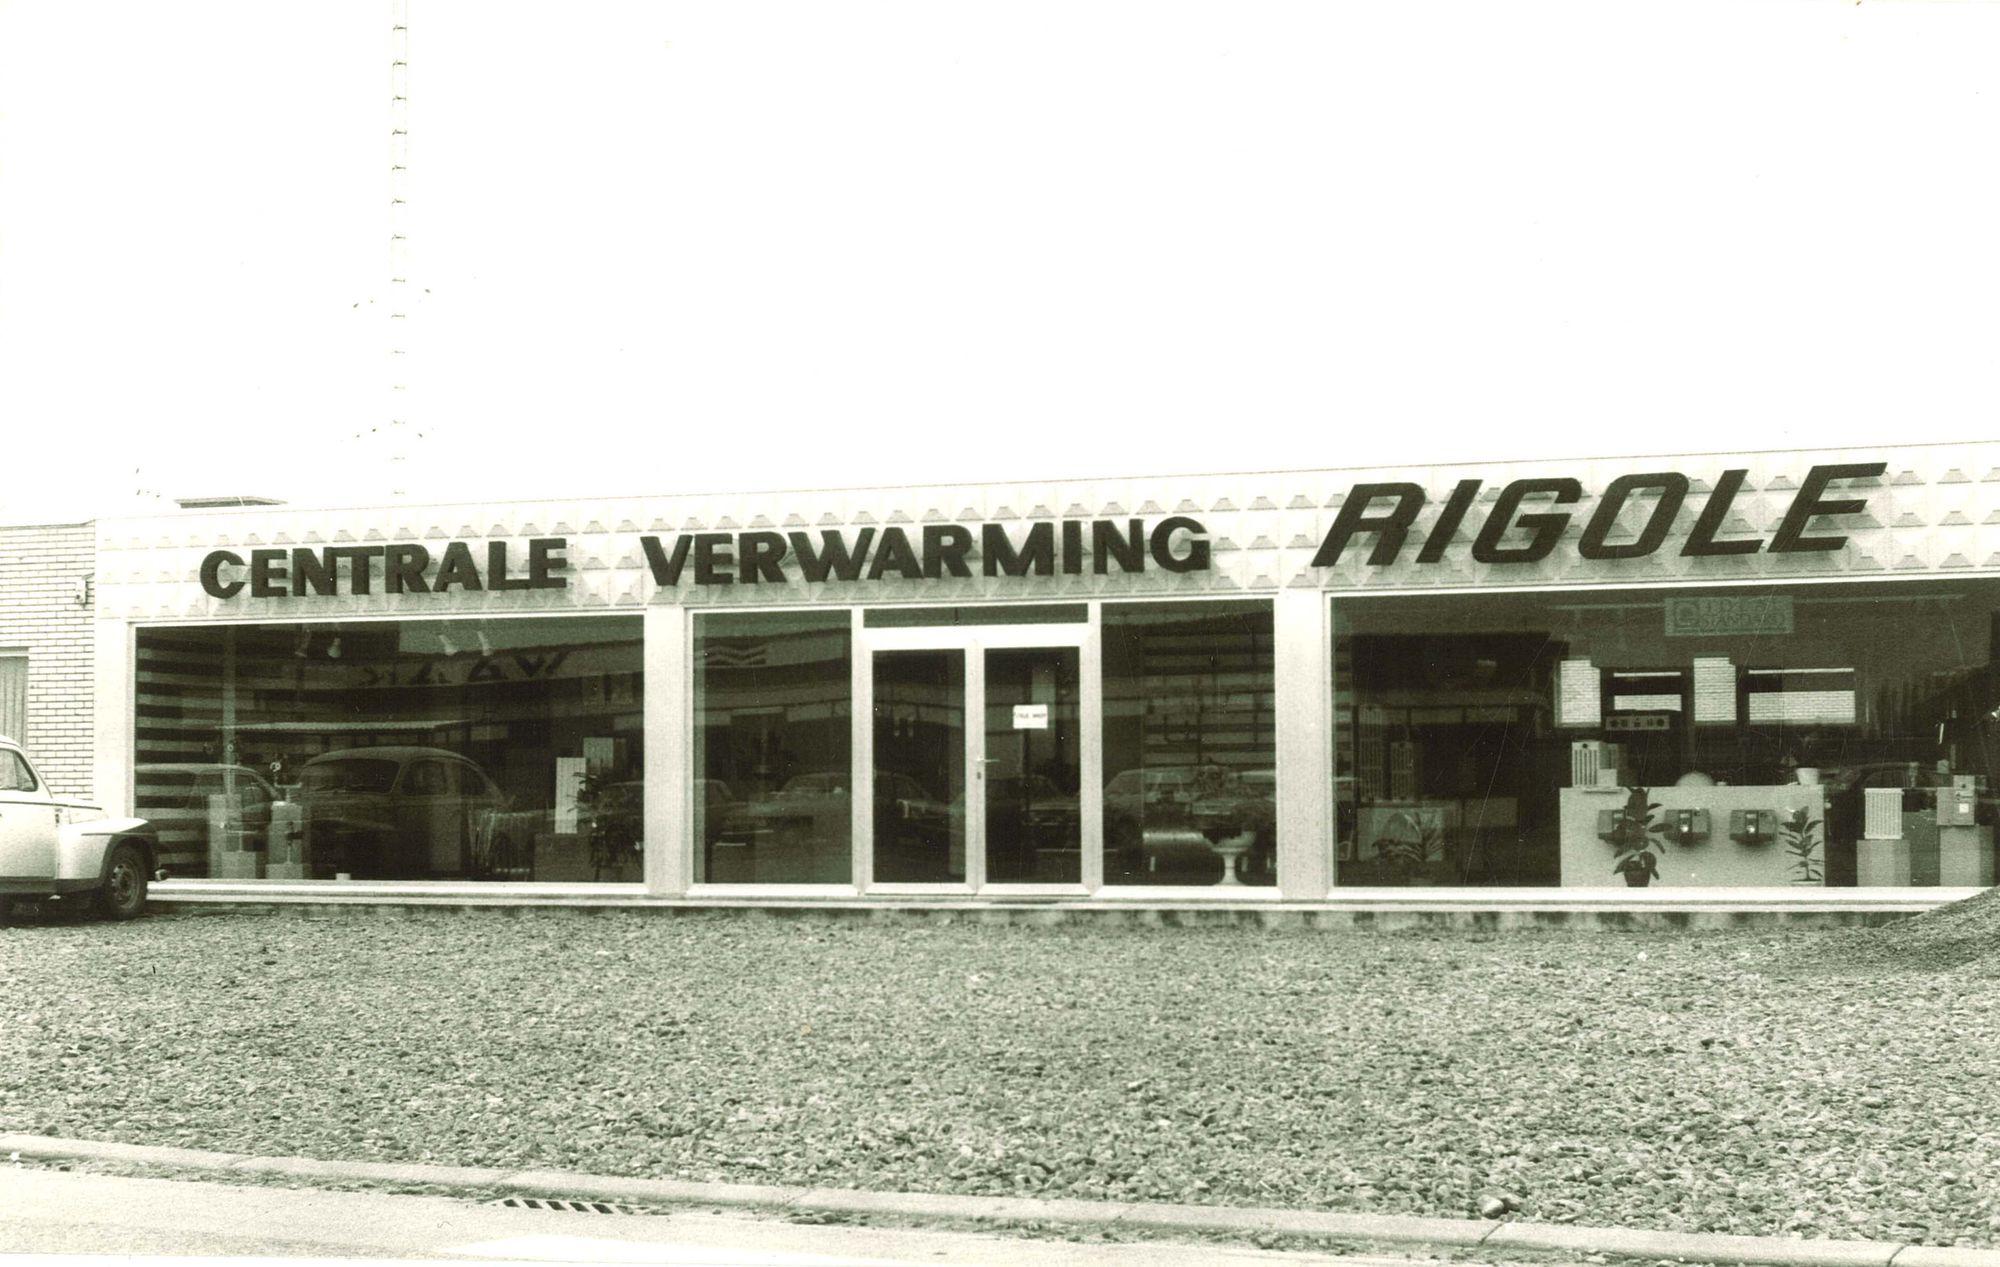 Centrale Verwarming Rigole 1975